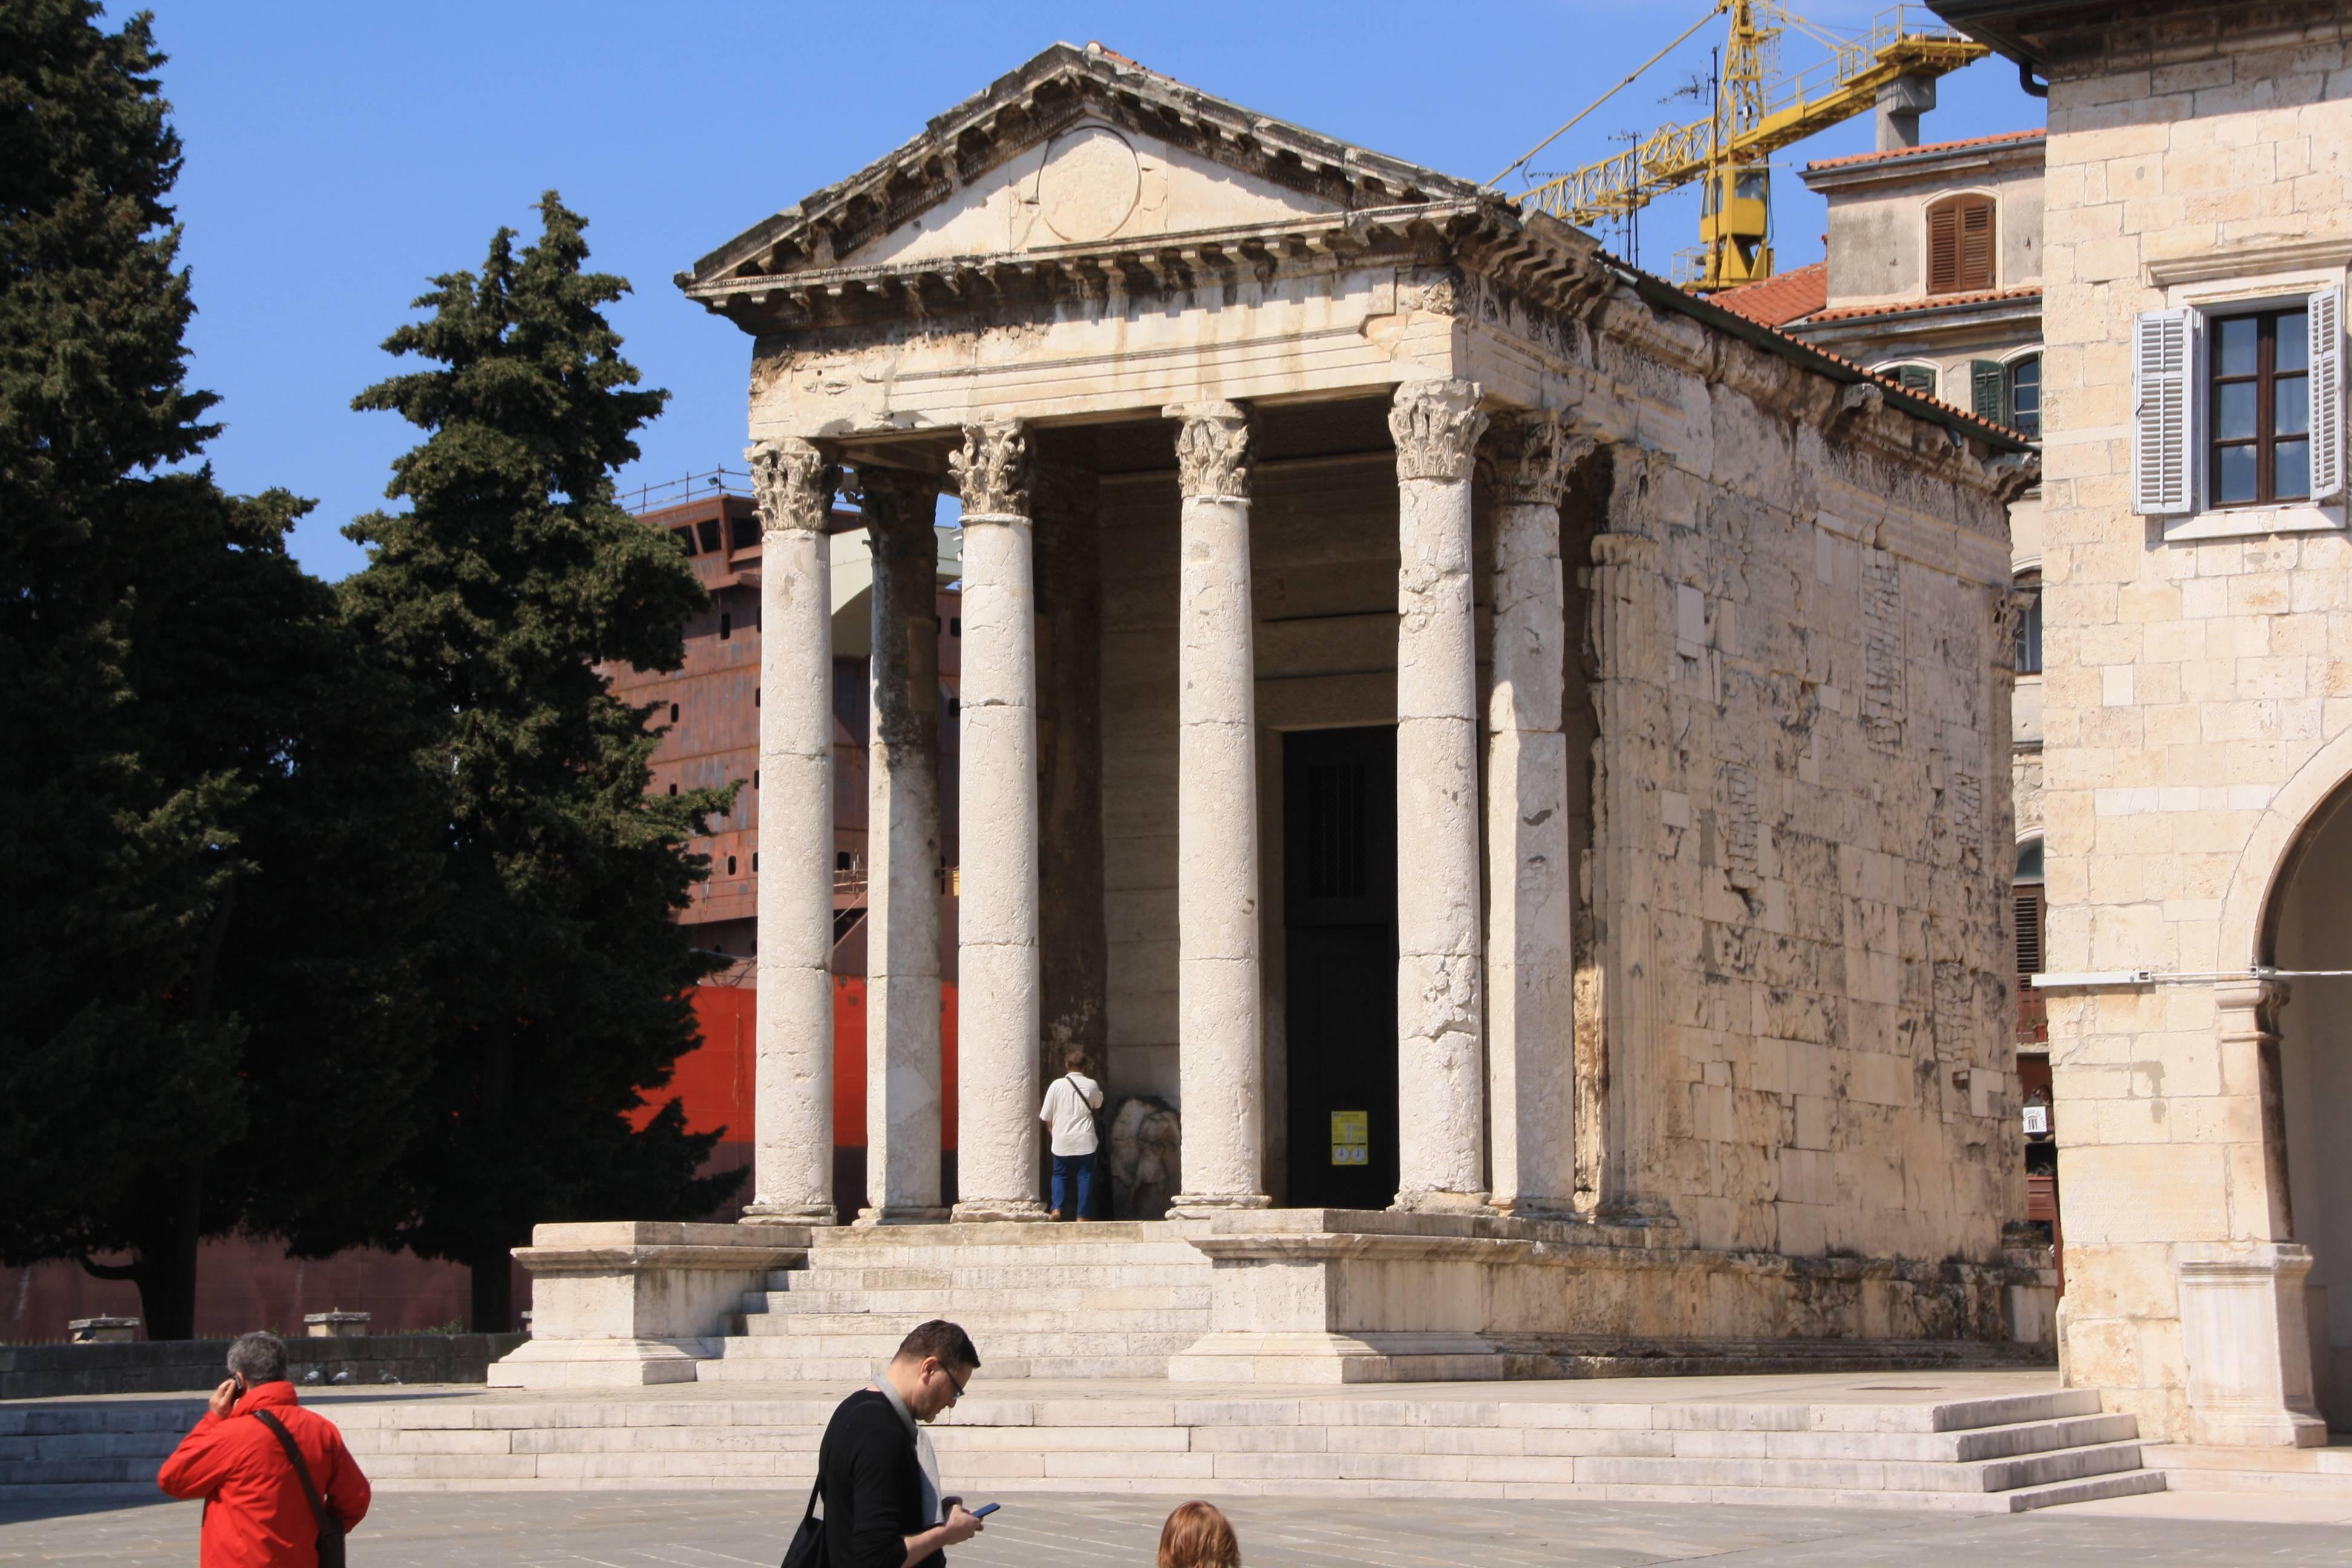 Temple of Jupiter, Pula, Croatia